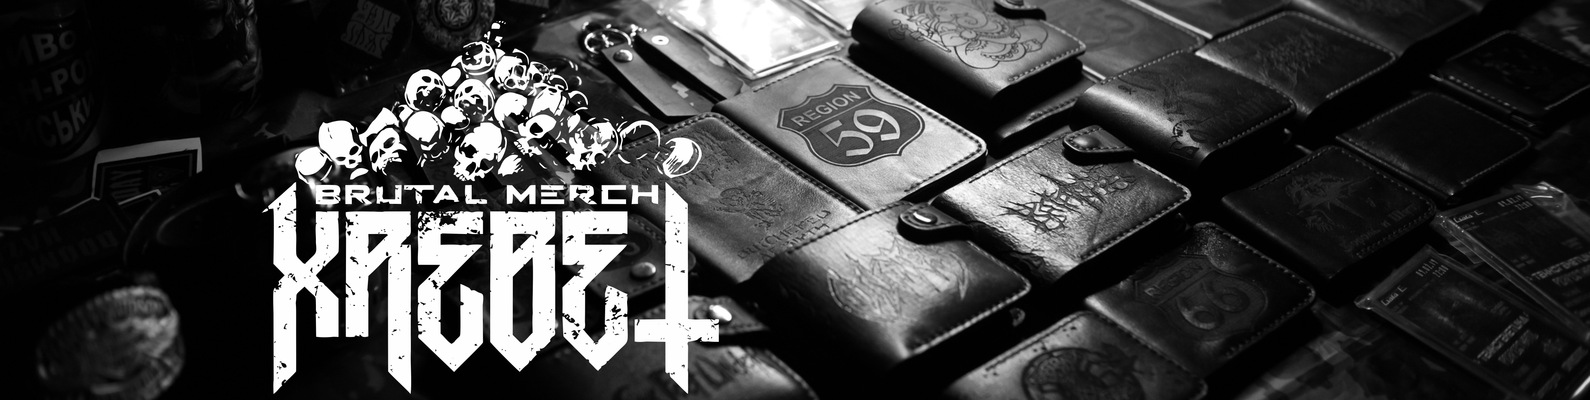 XREBET leather brutal merch | ВКонтакте